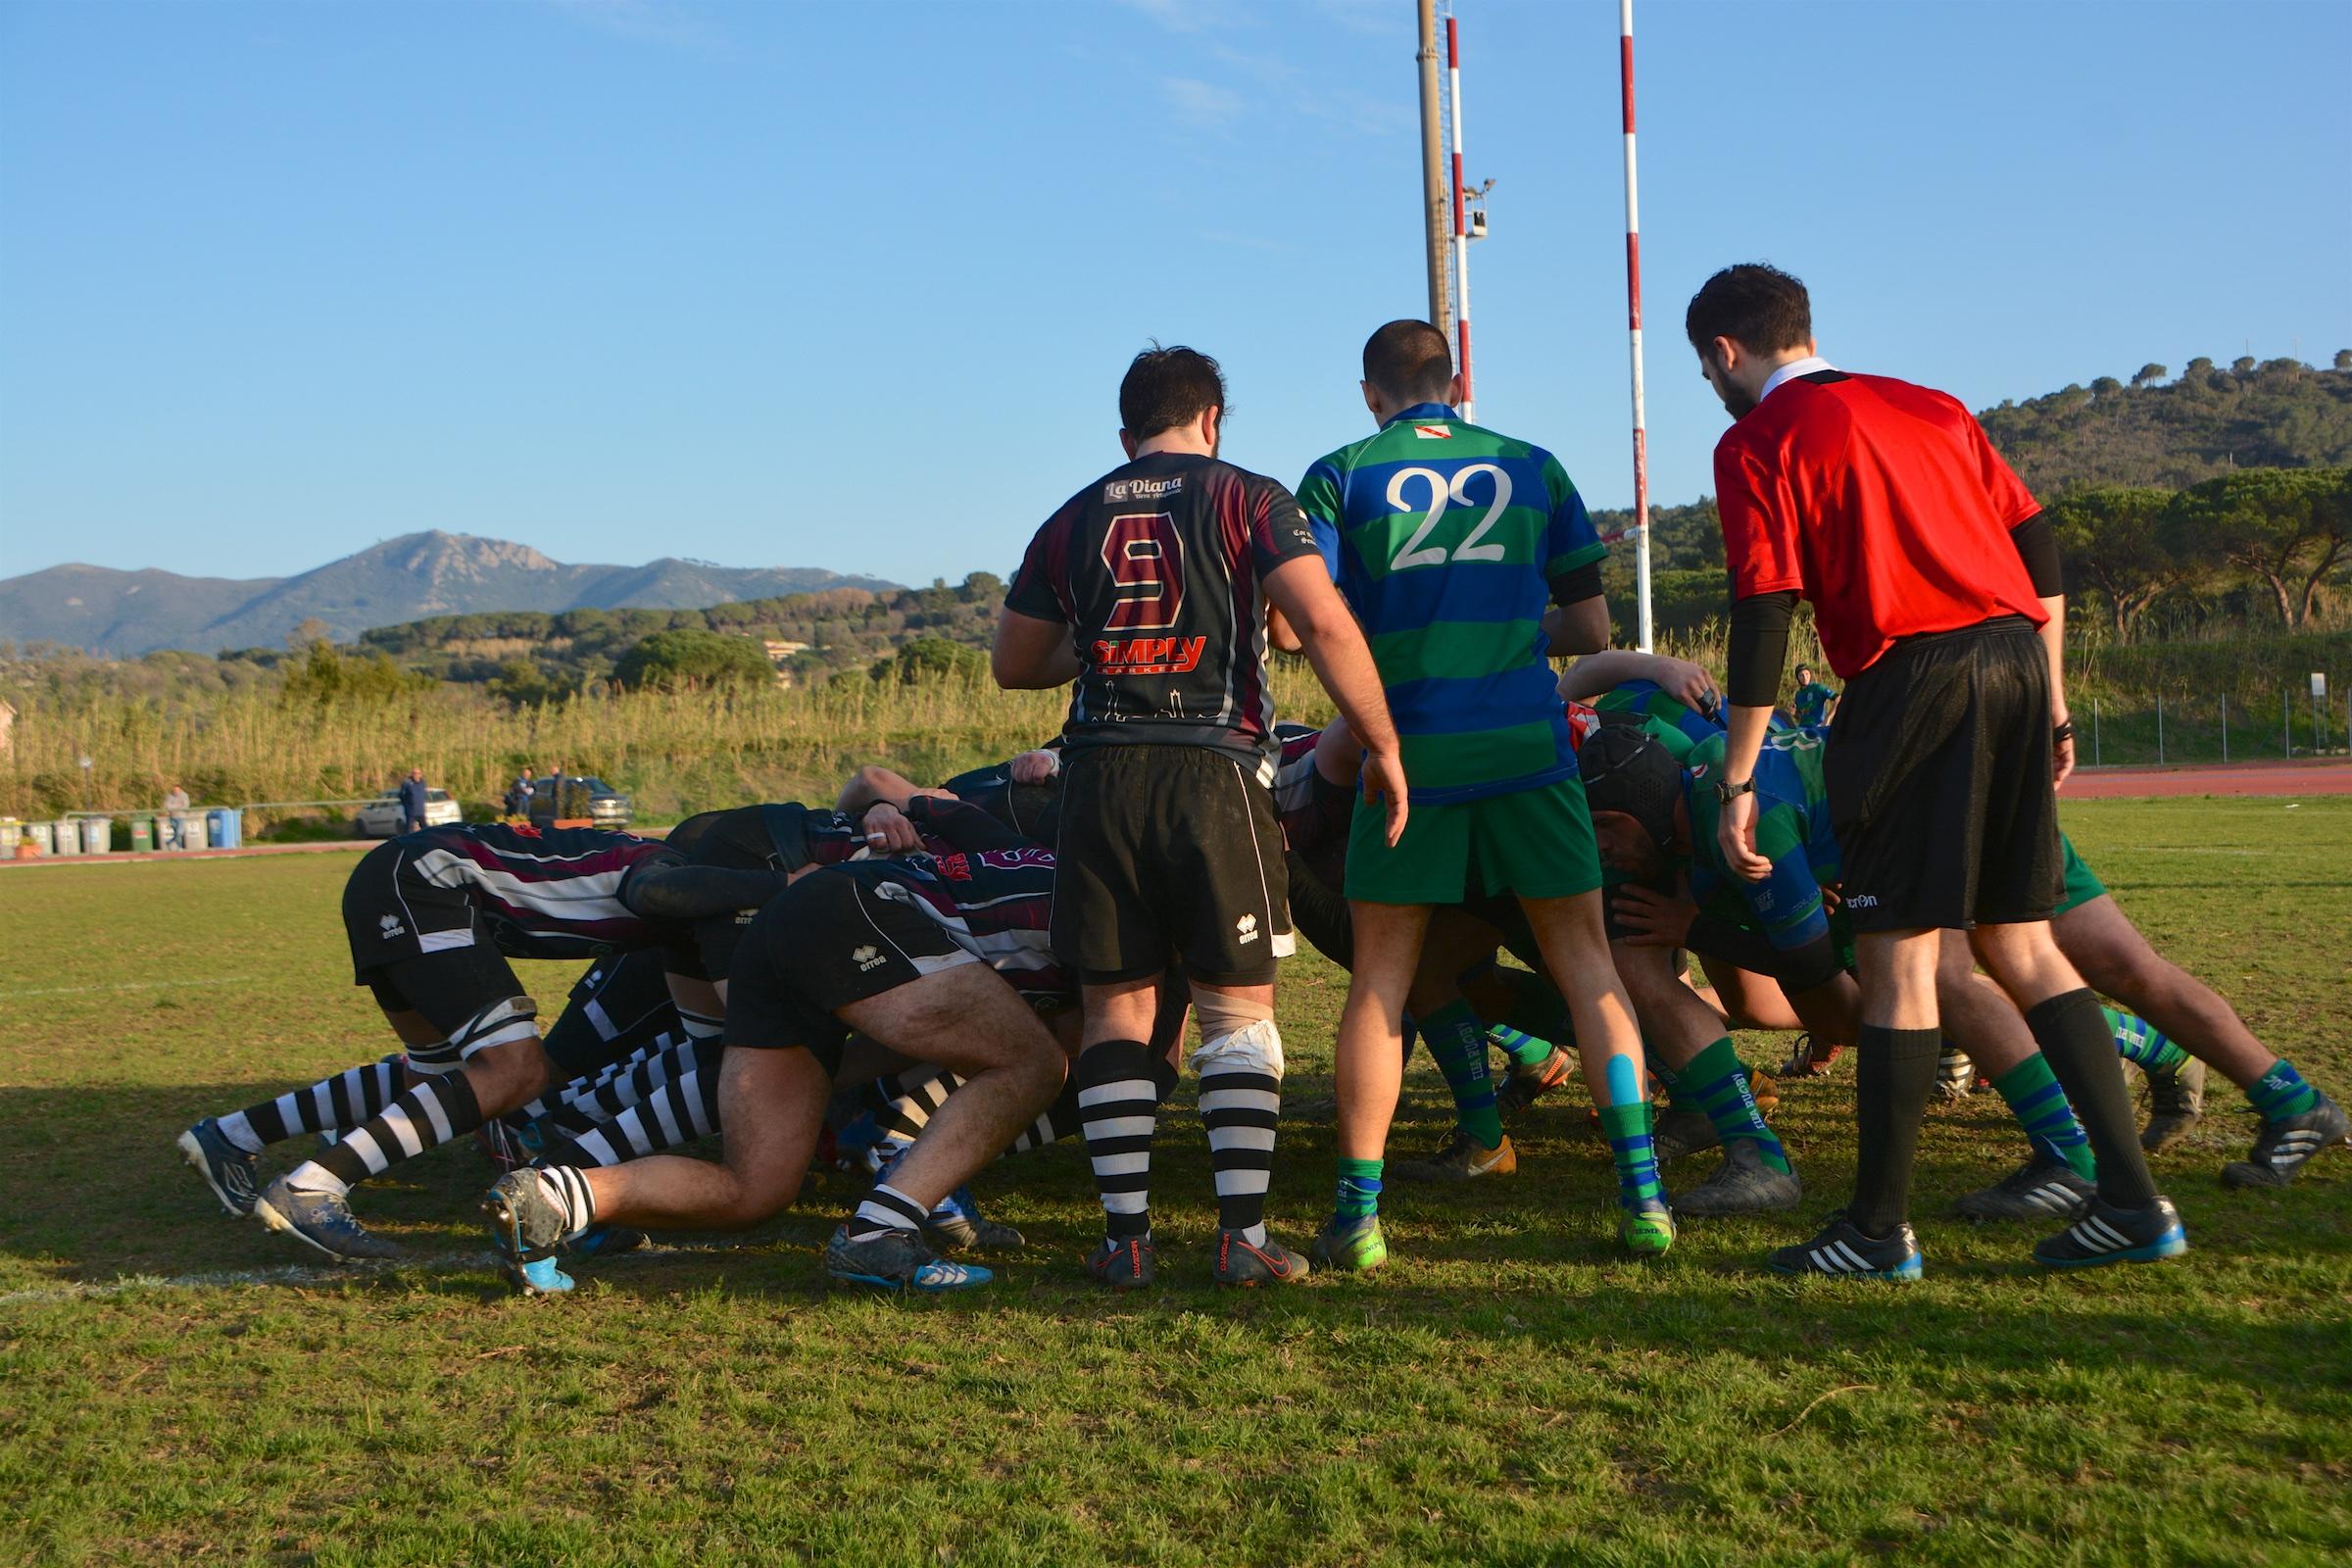 Banca CRAS CUS Siena Rugby all'Isola d'Elba.